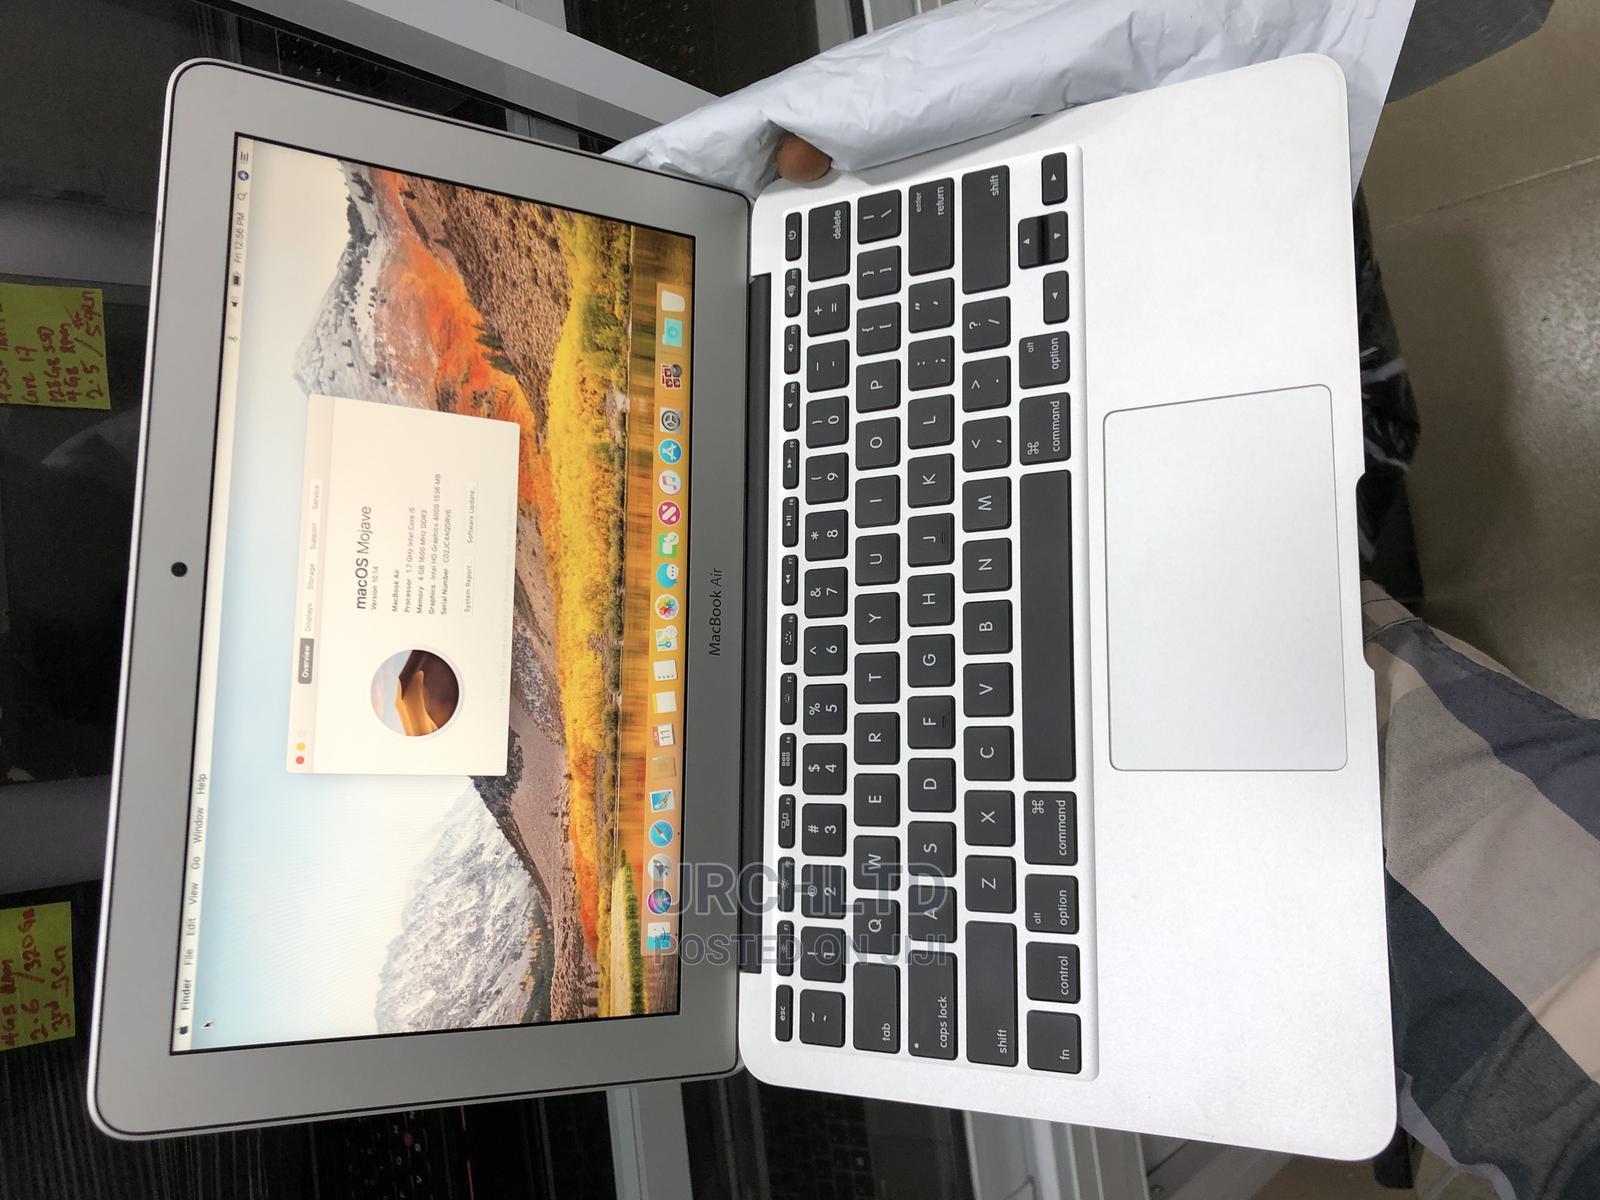 Laptop Apple MacBook Air 2012 4GB Intel Core I5 SSD 60GB